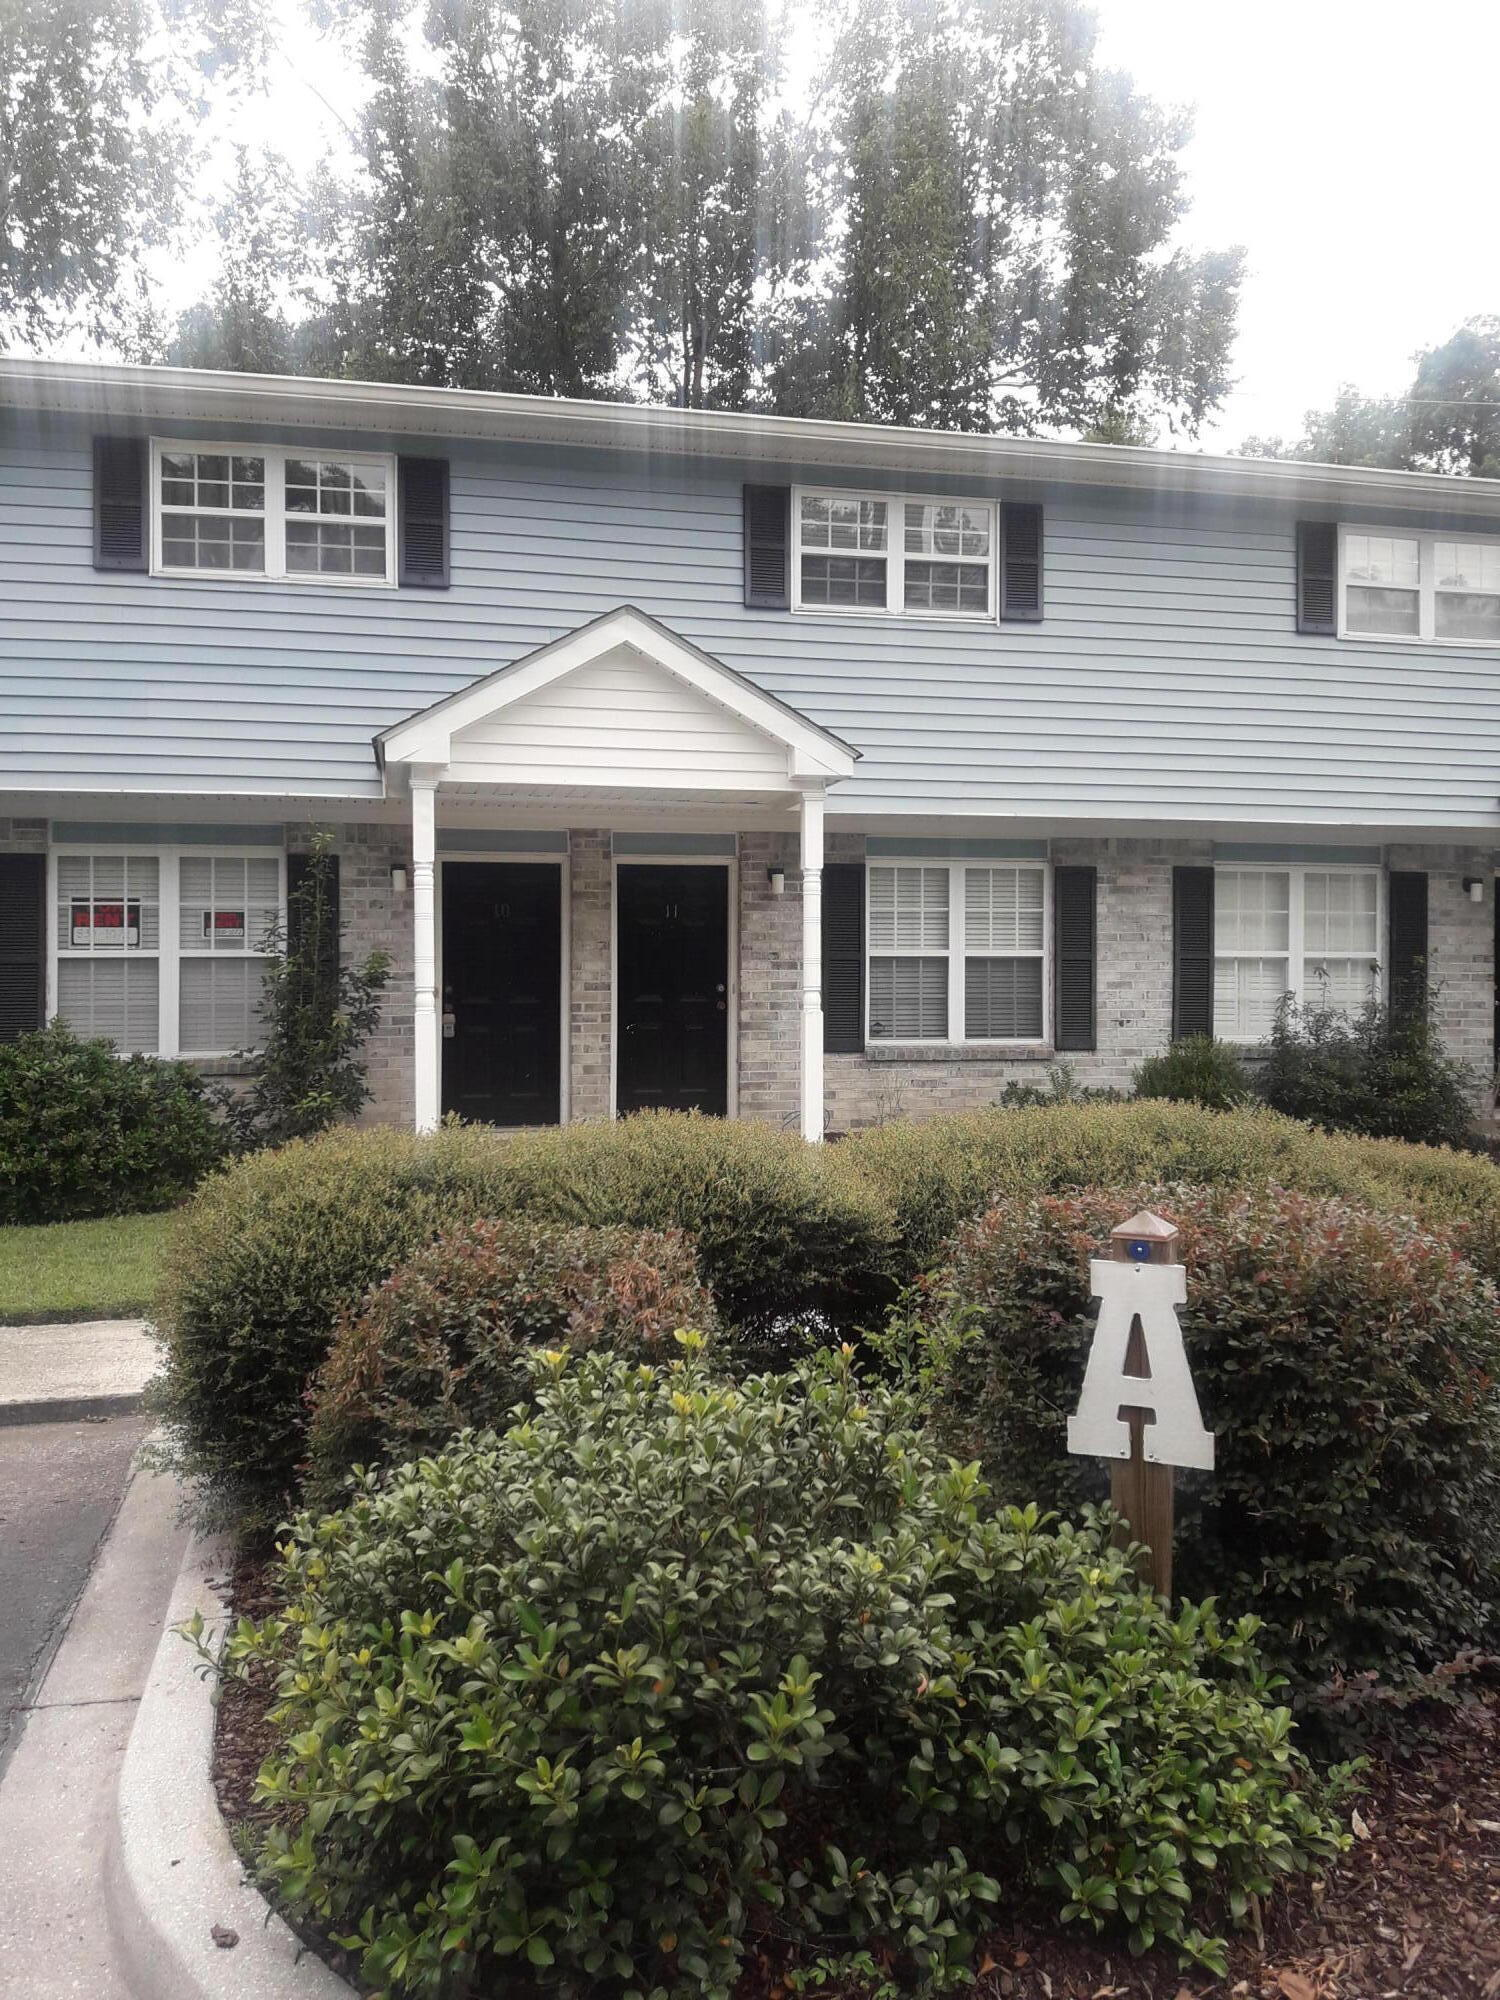 Wildwood Town Homes Homes For Sale - 507 Stinson, Charleston, SC - 9